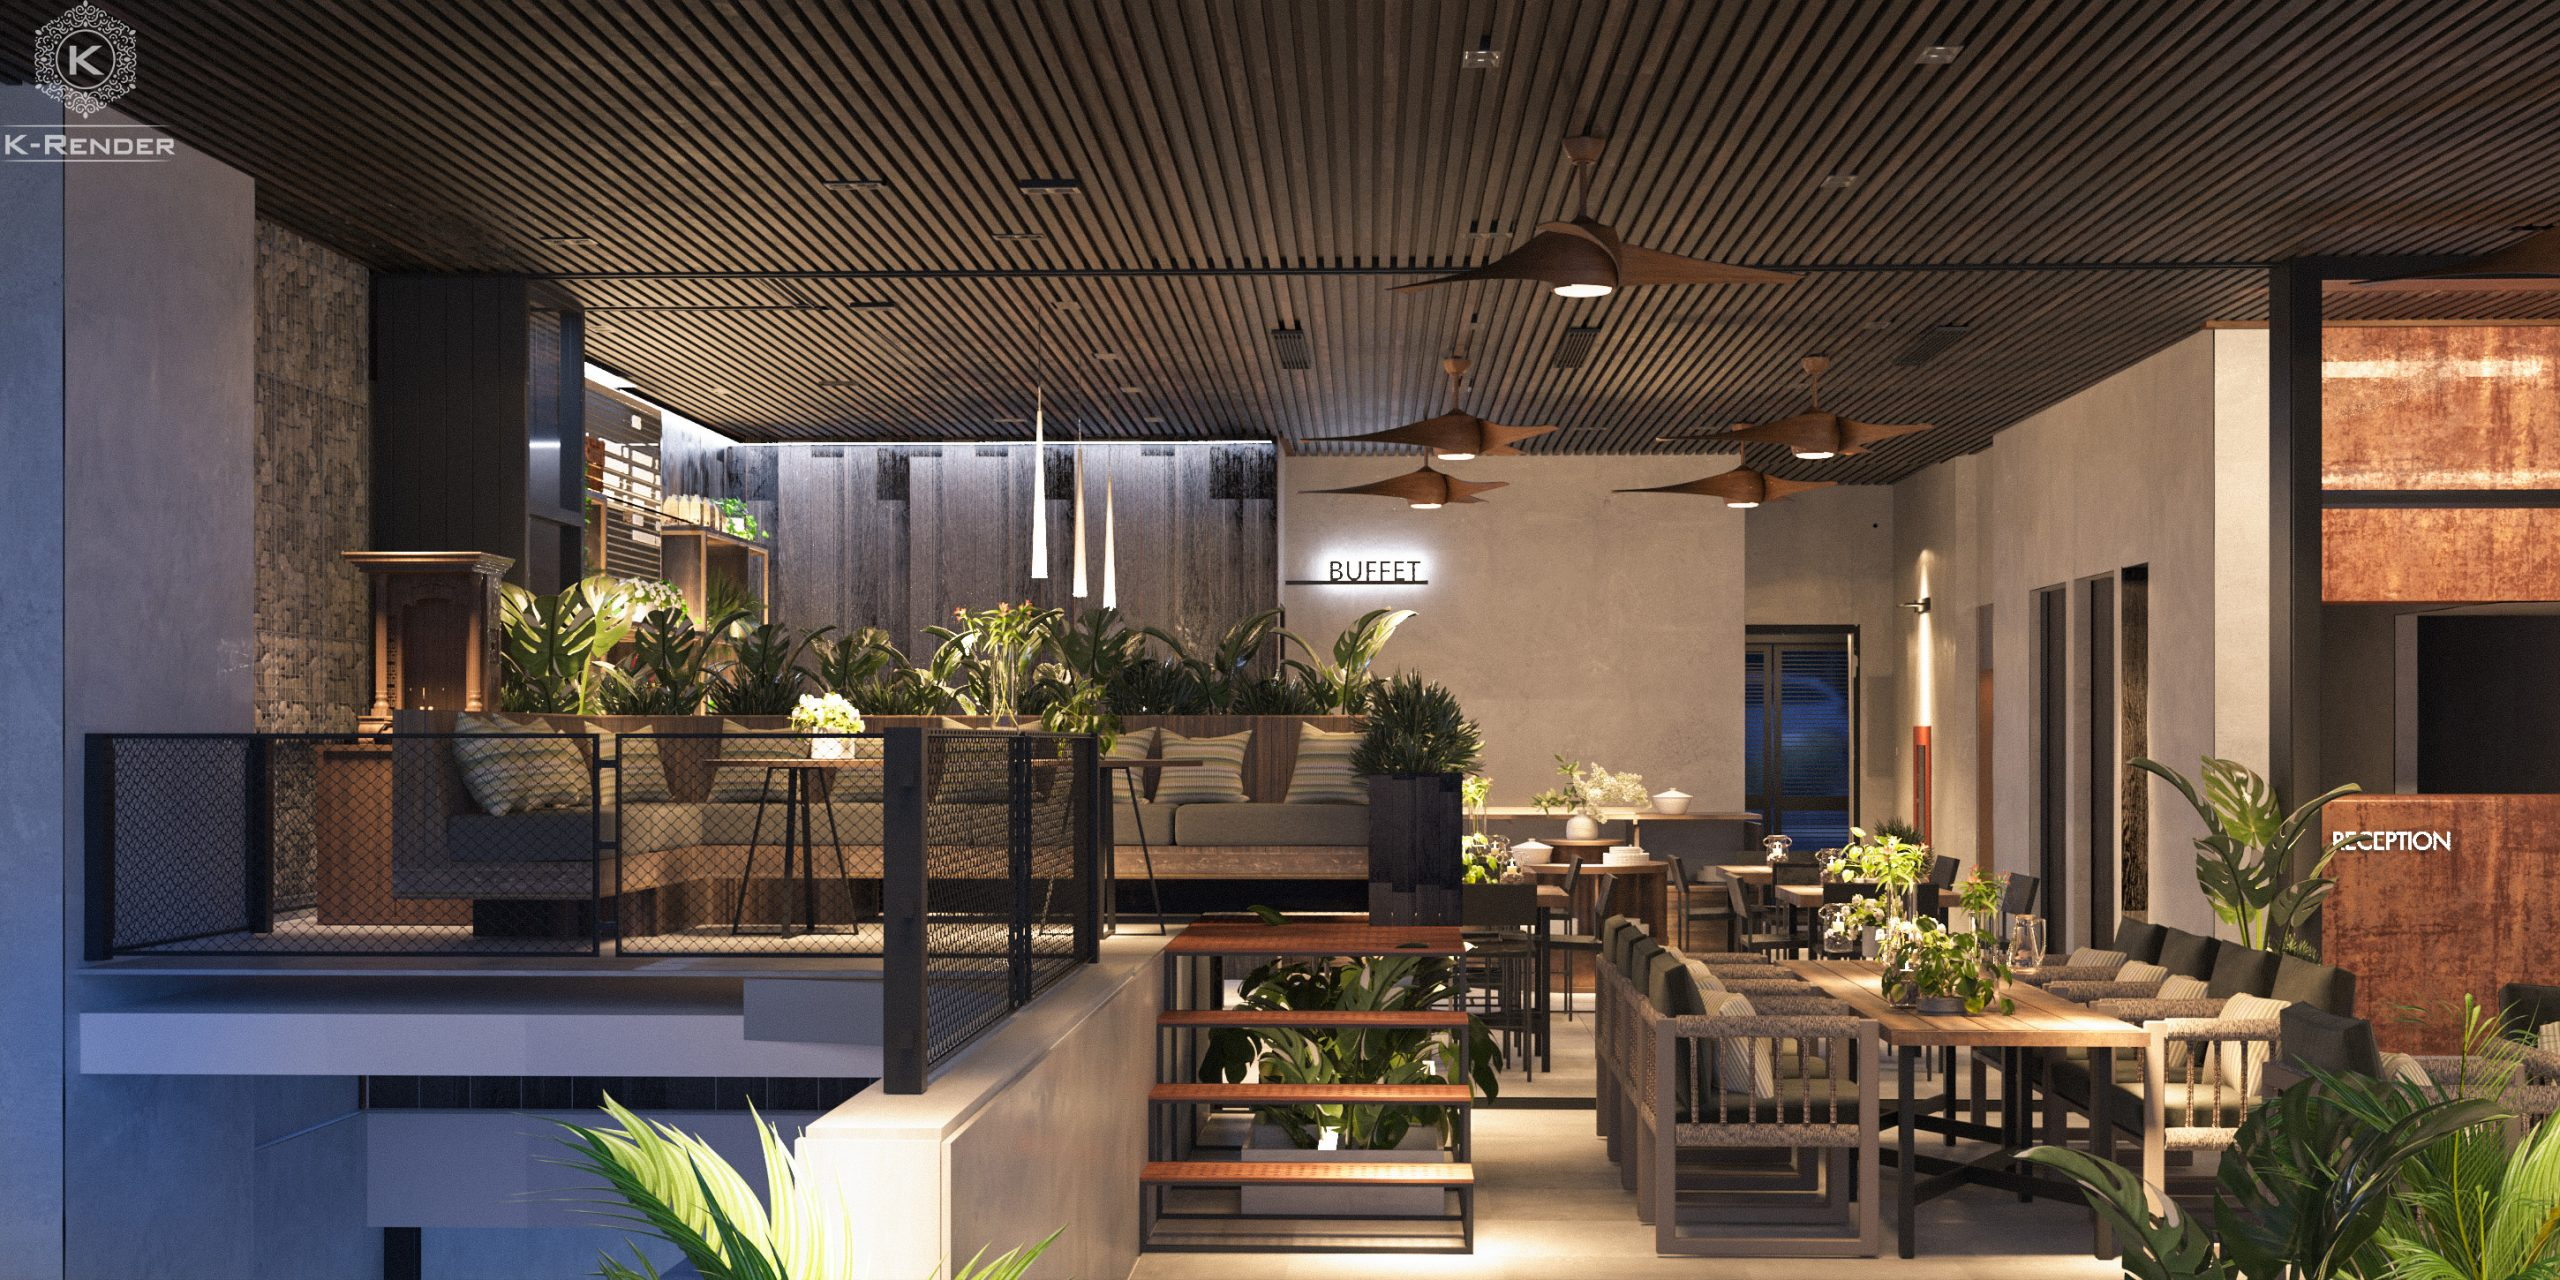 the-summer-bar-and-restaurant-project-k-render-studio-25